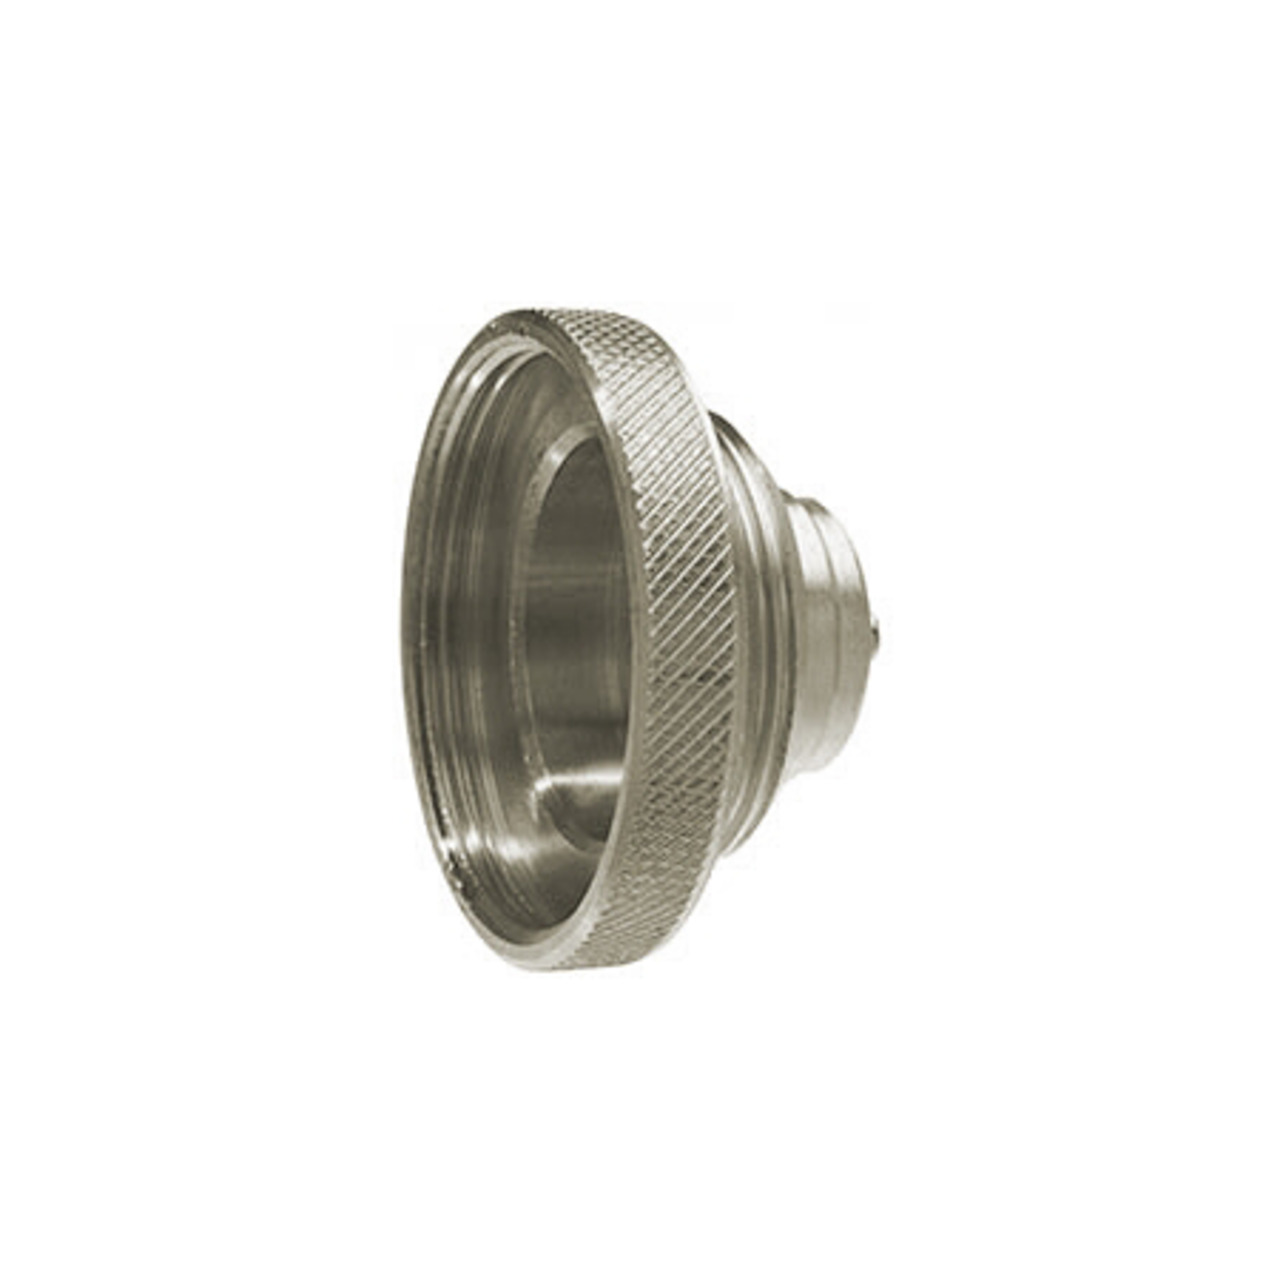 Adapter für Heizungsventil Ondal M38 x 1-5 mm (Messing)